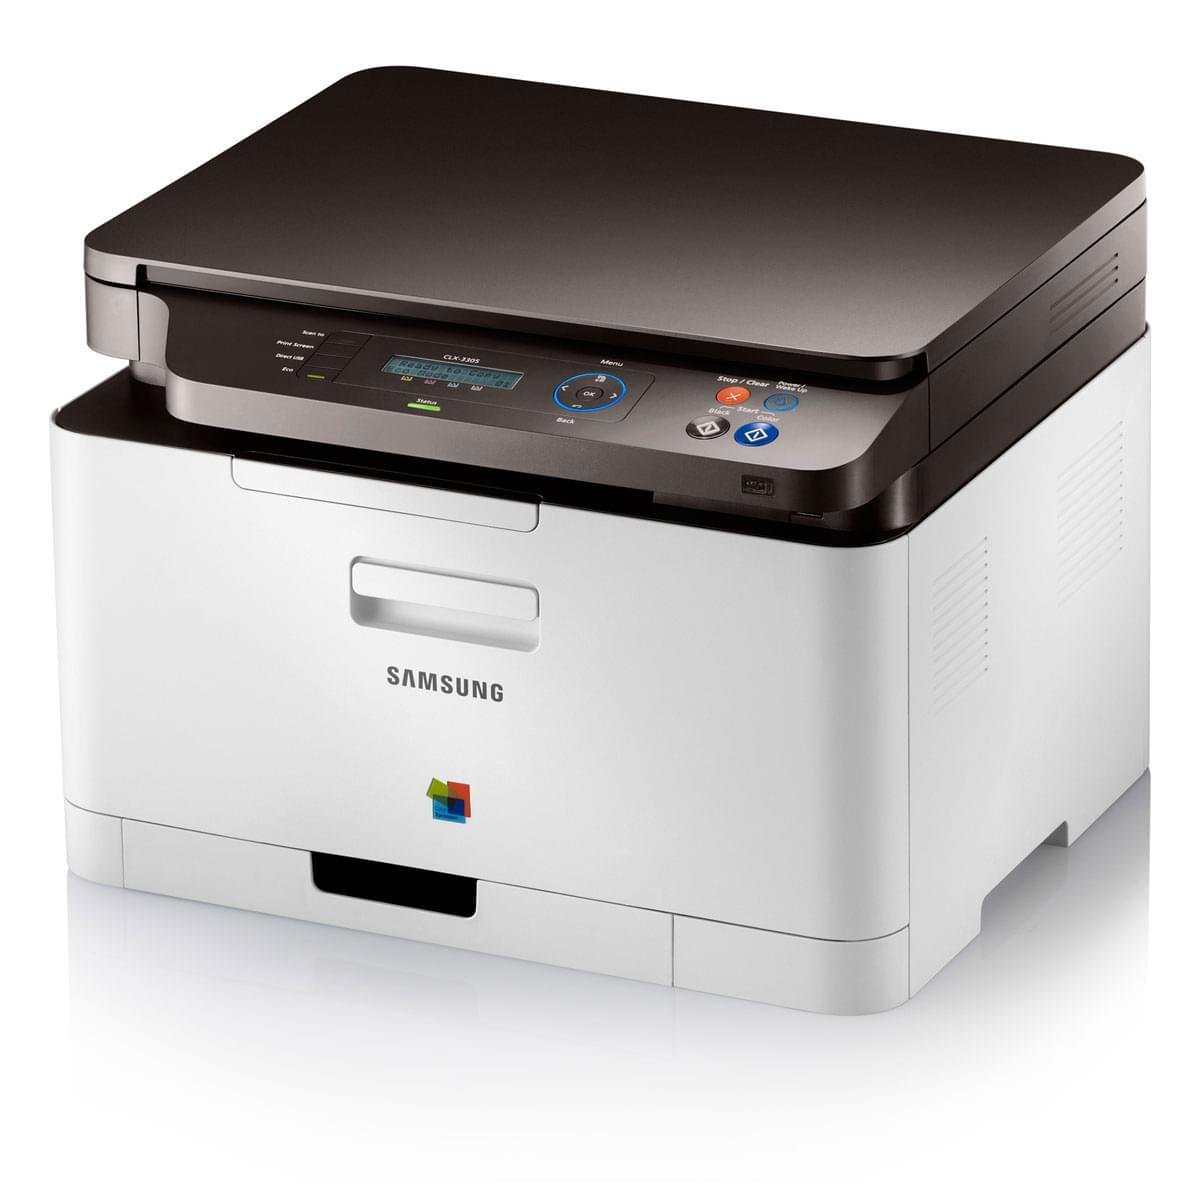 Imprimante multifonction Samsung CLX-3305FW - Cybertek.fr - 0